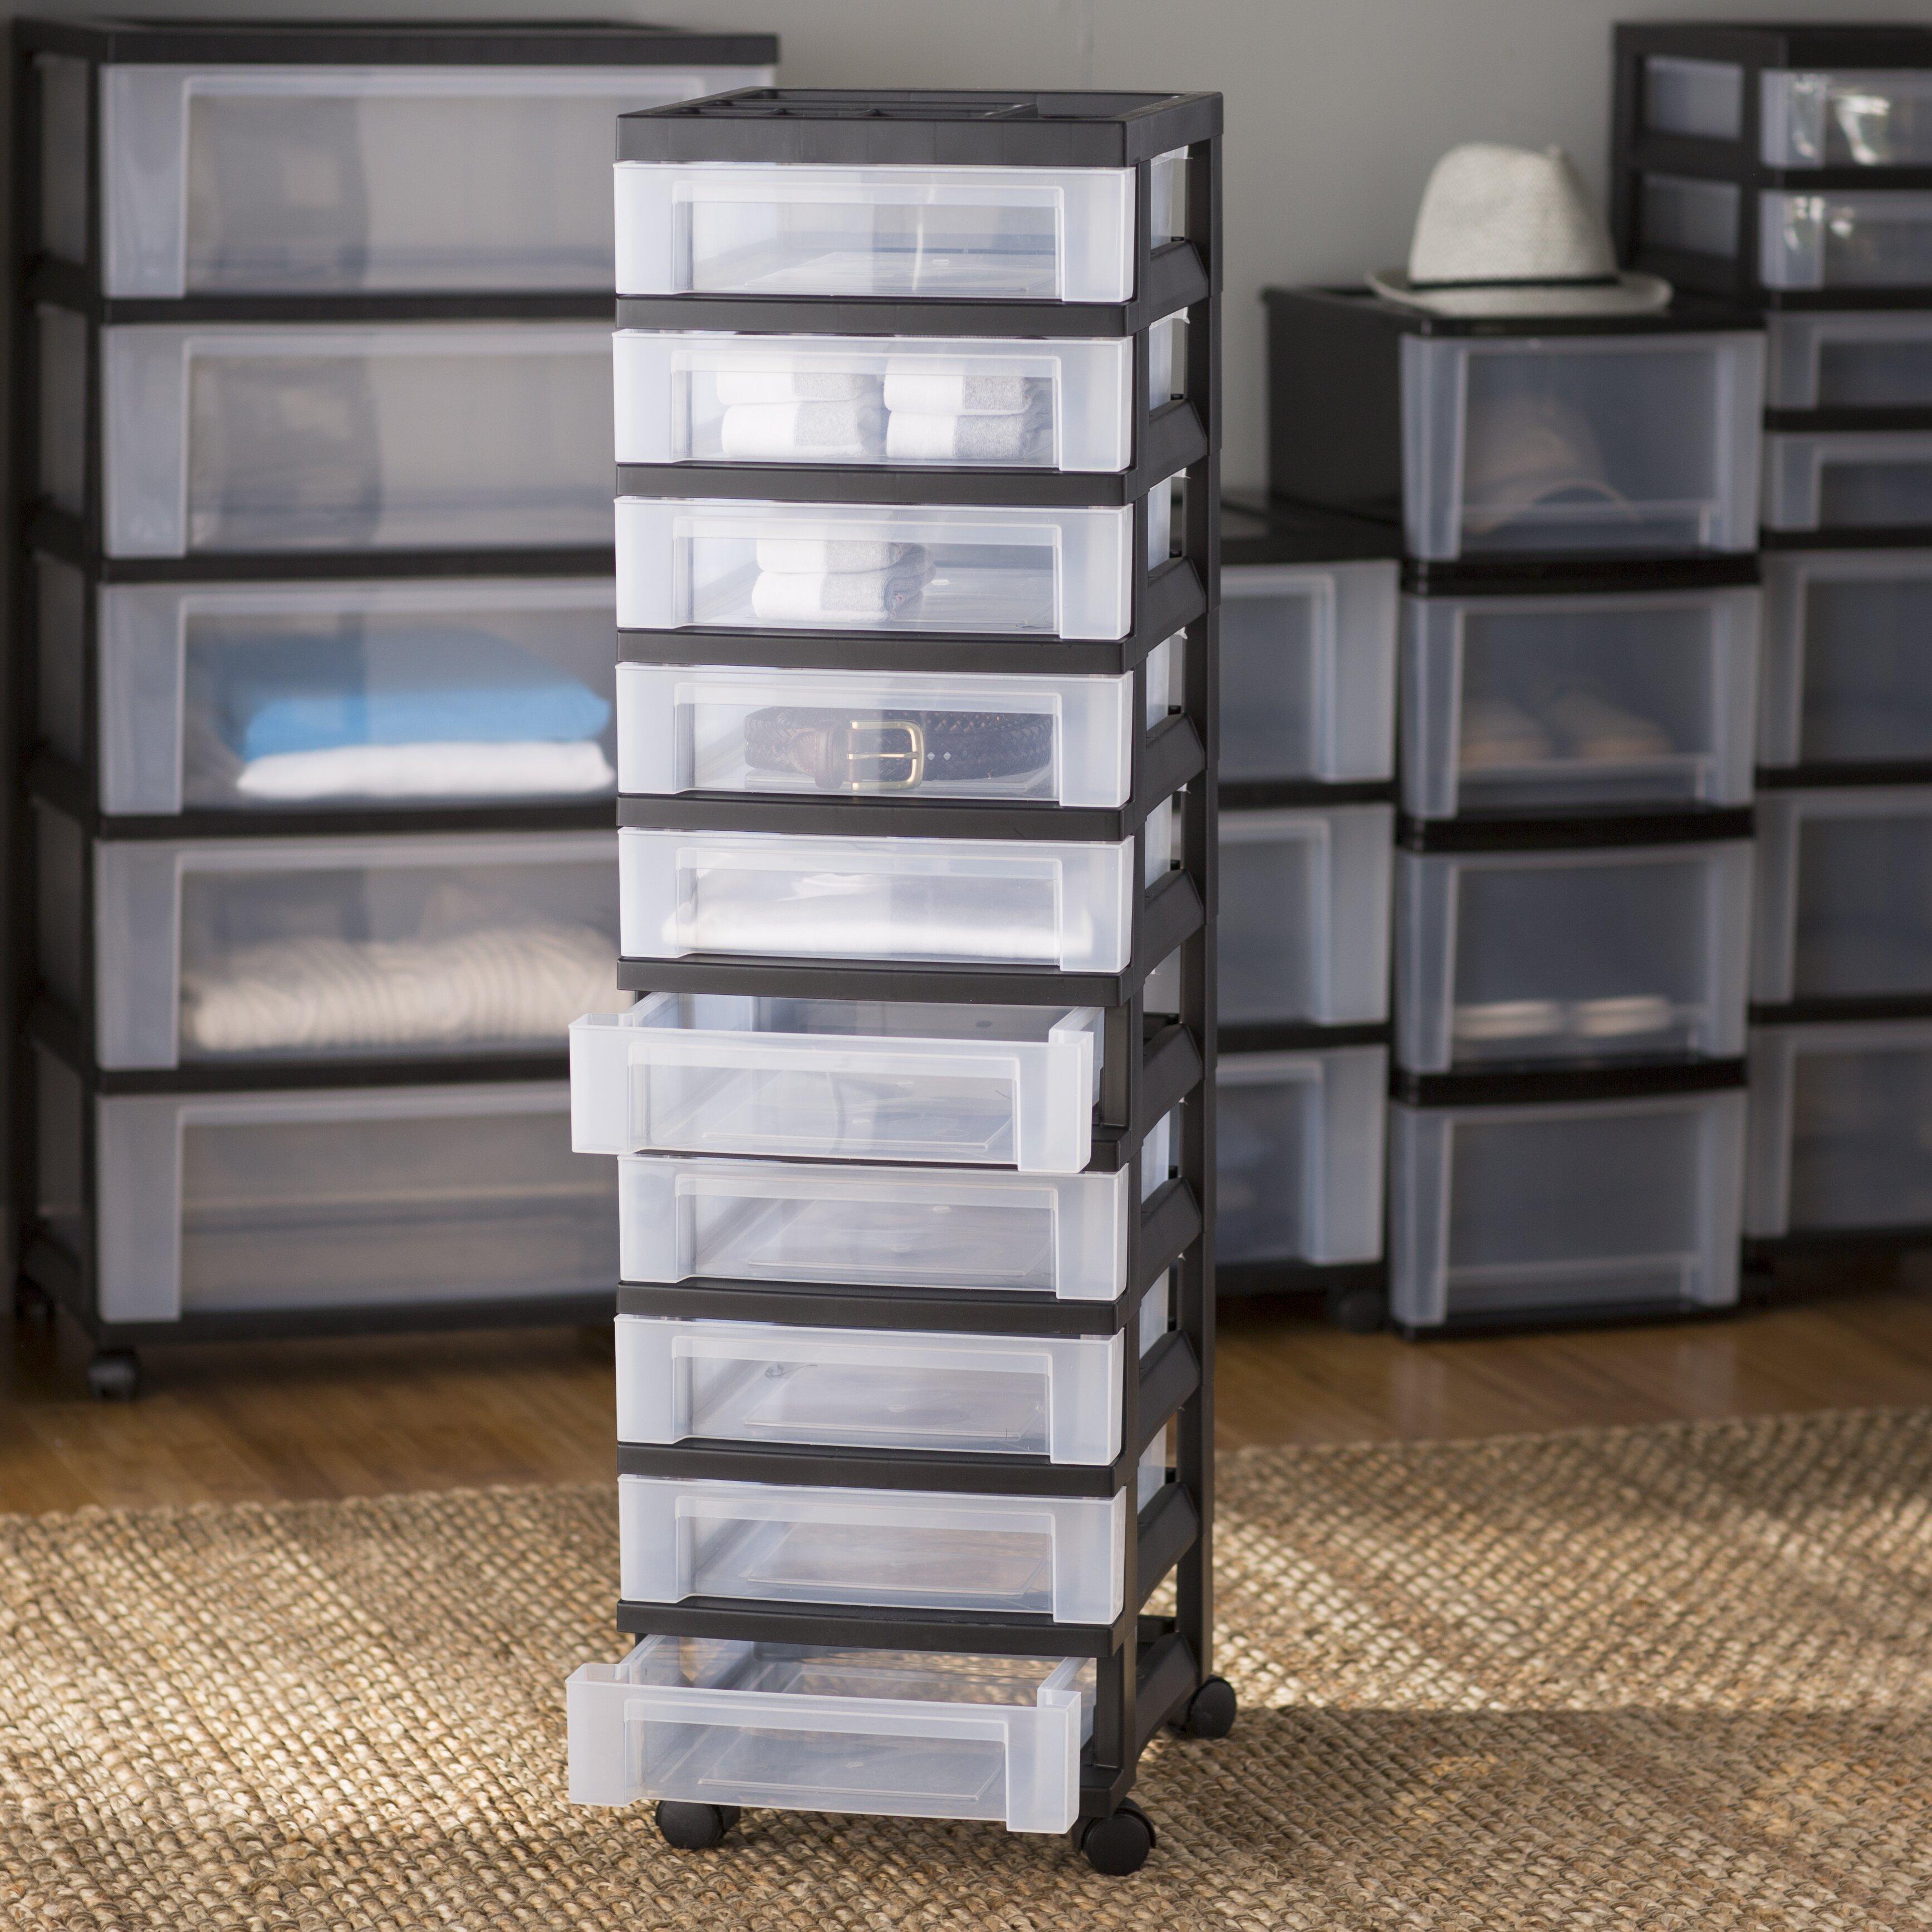 wayfair basics wayfair basics 10 drawer storage chest. Black Bedroom Furniture Sets. Home Design Ideas